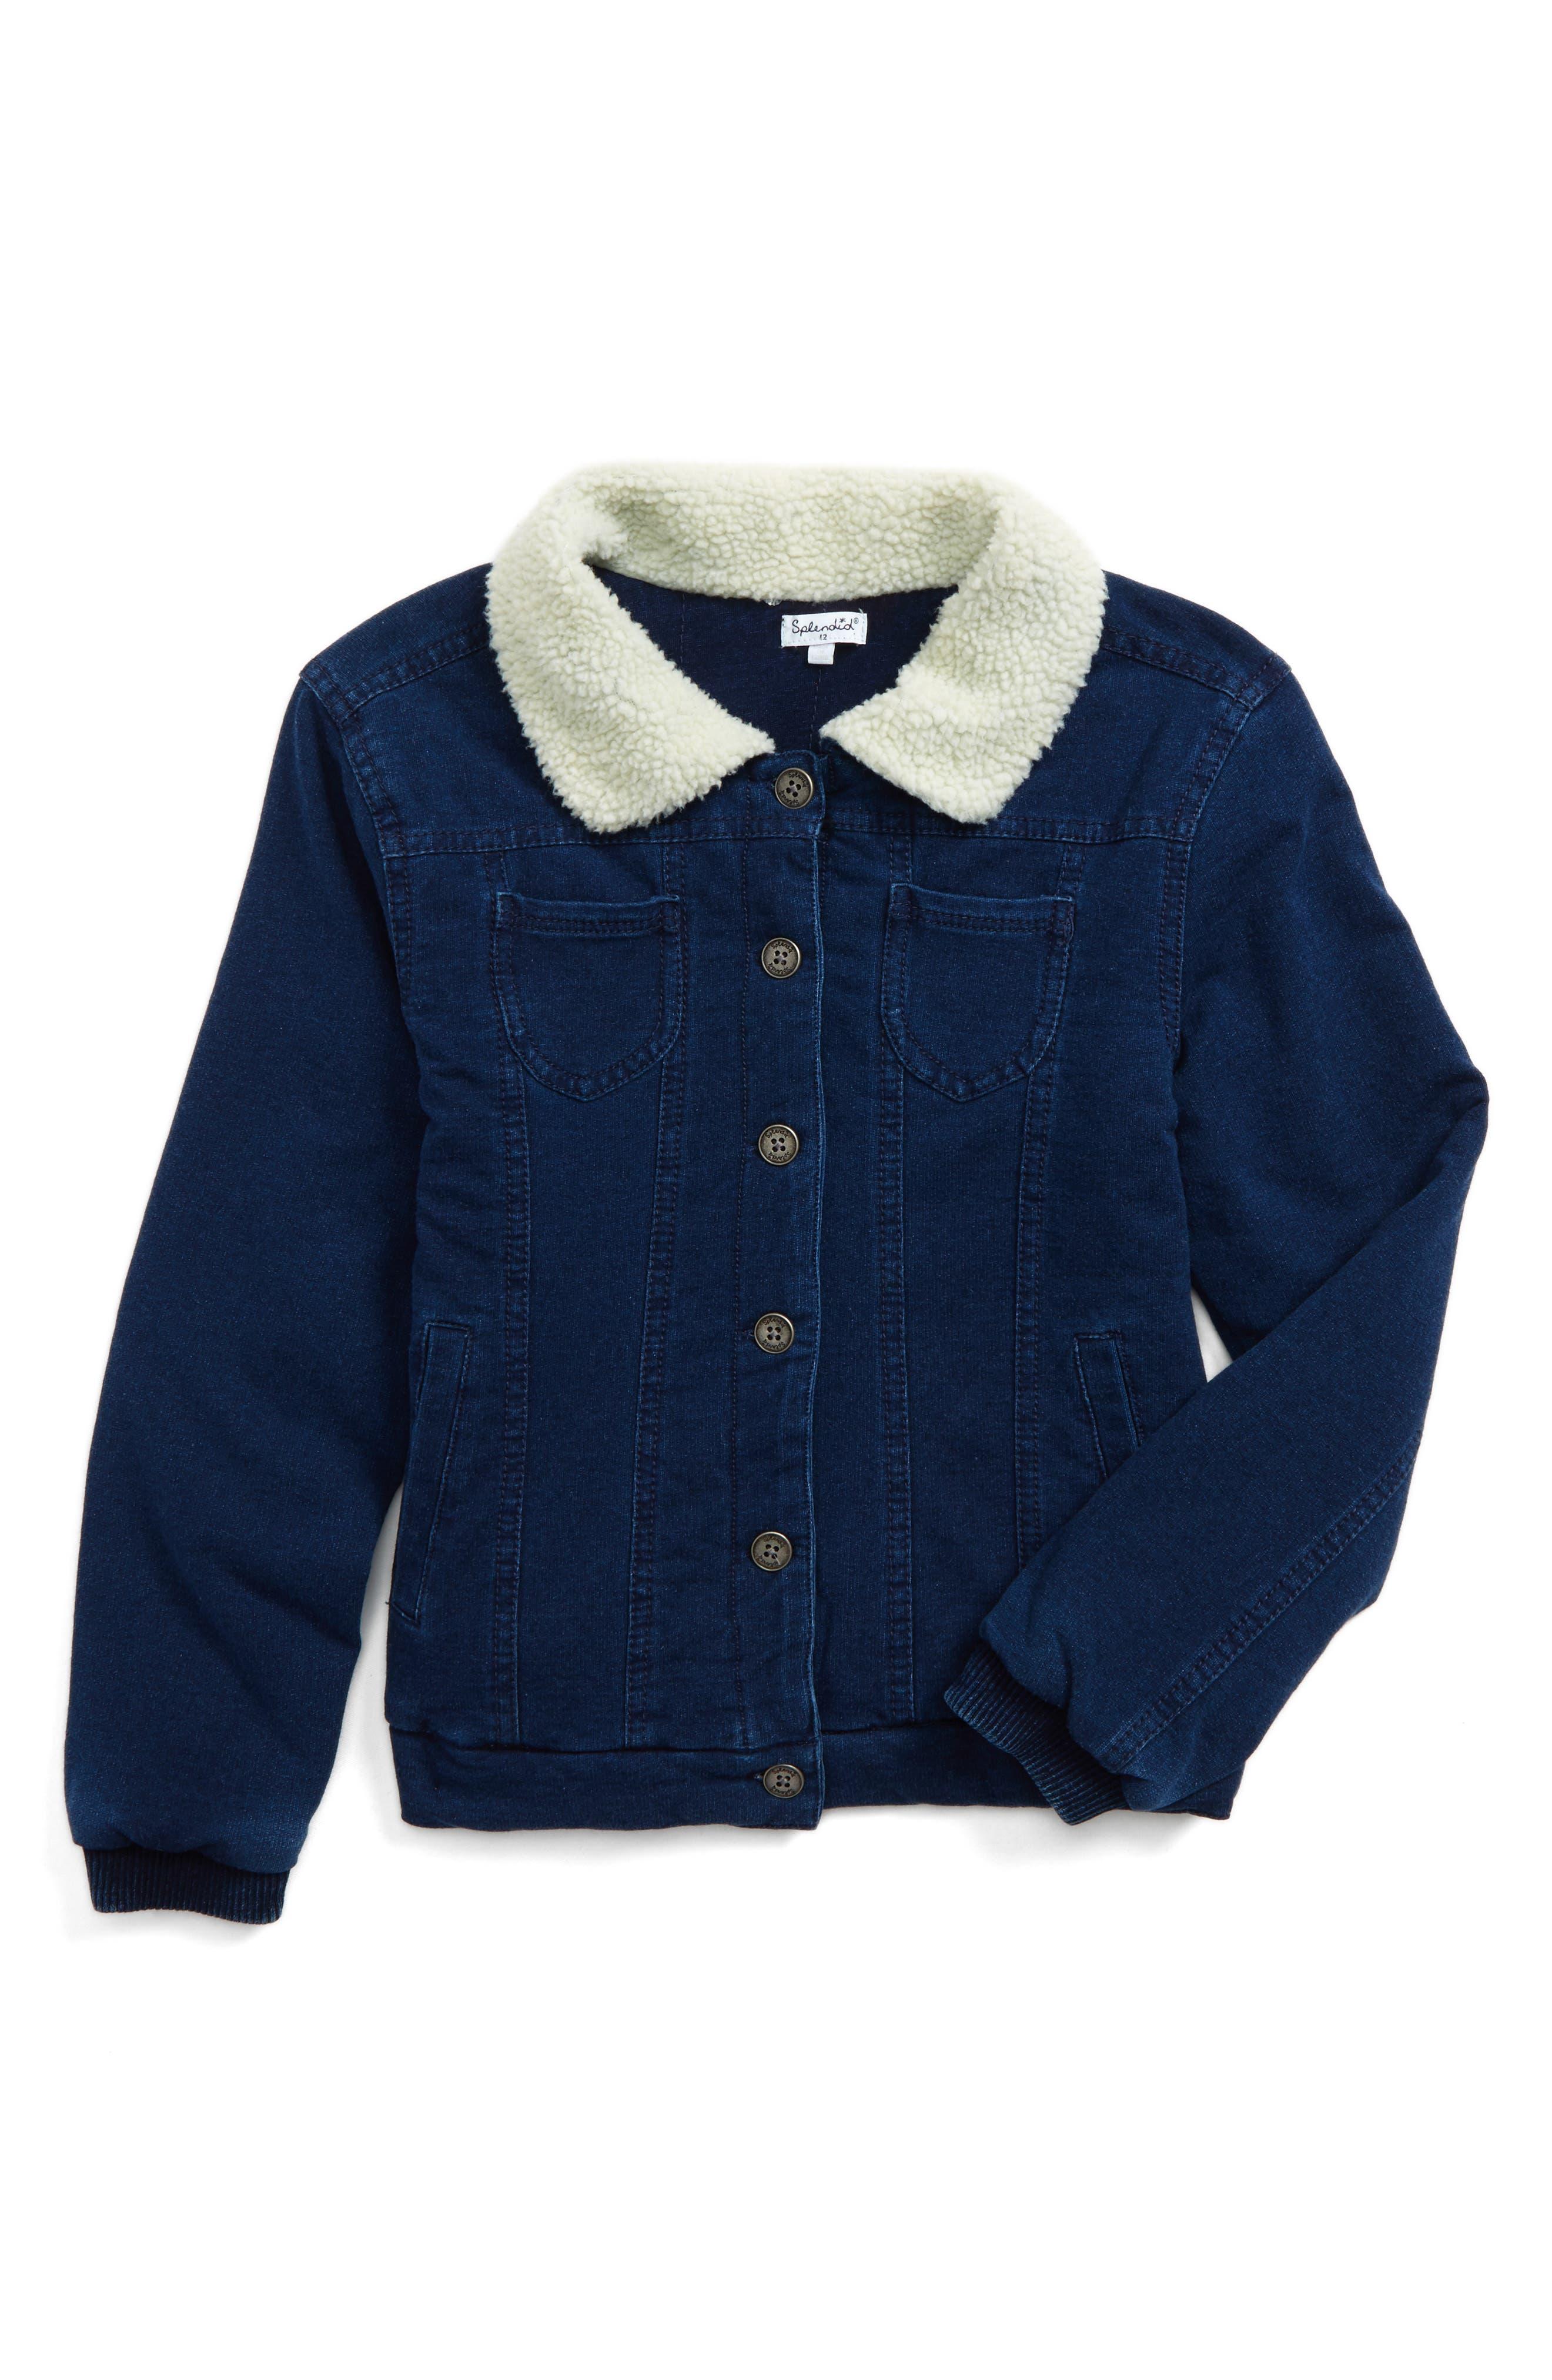 Alternate Image 1 Selected - Splendid Denim Jacket (Big Girls)